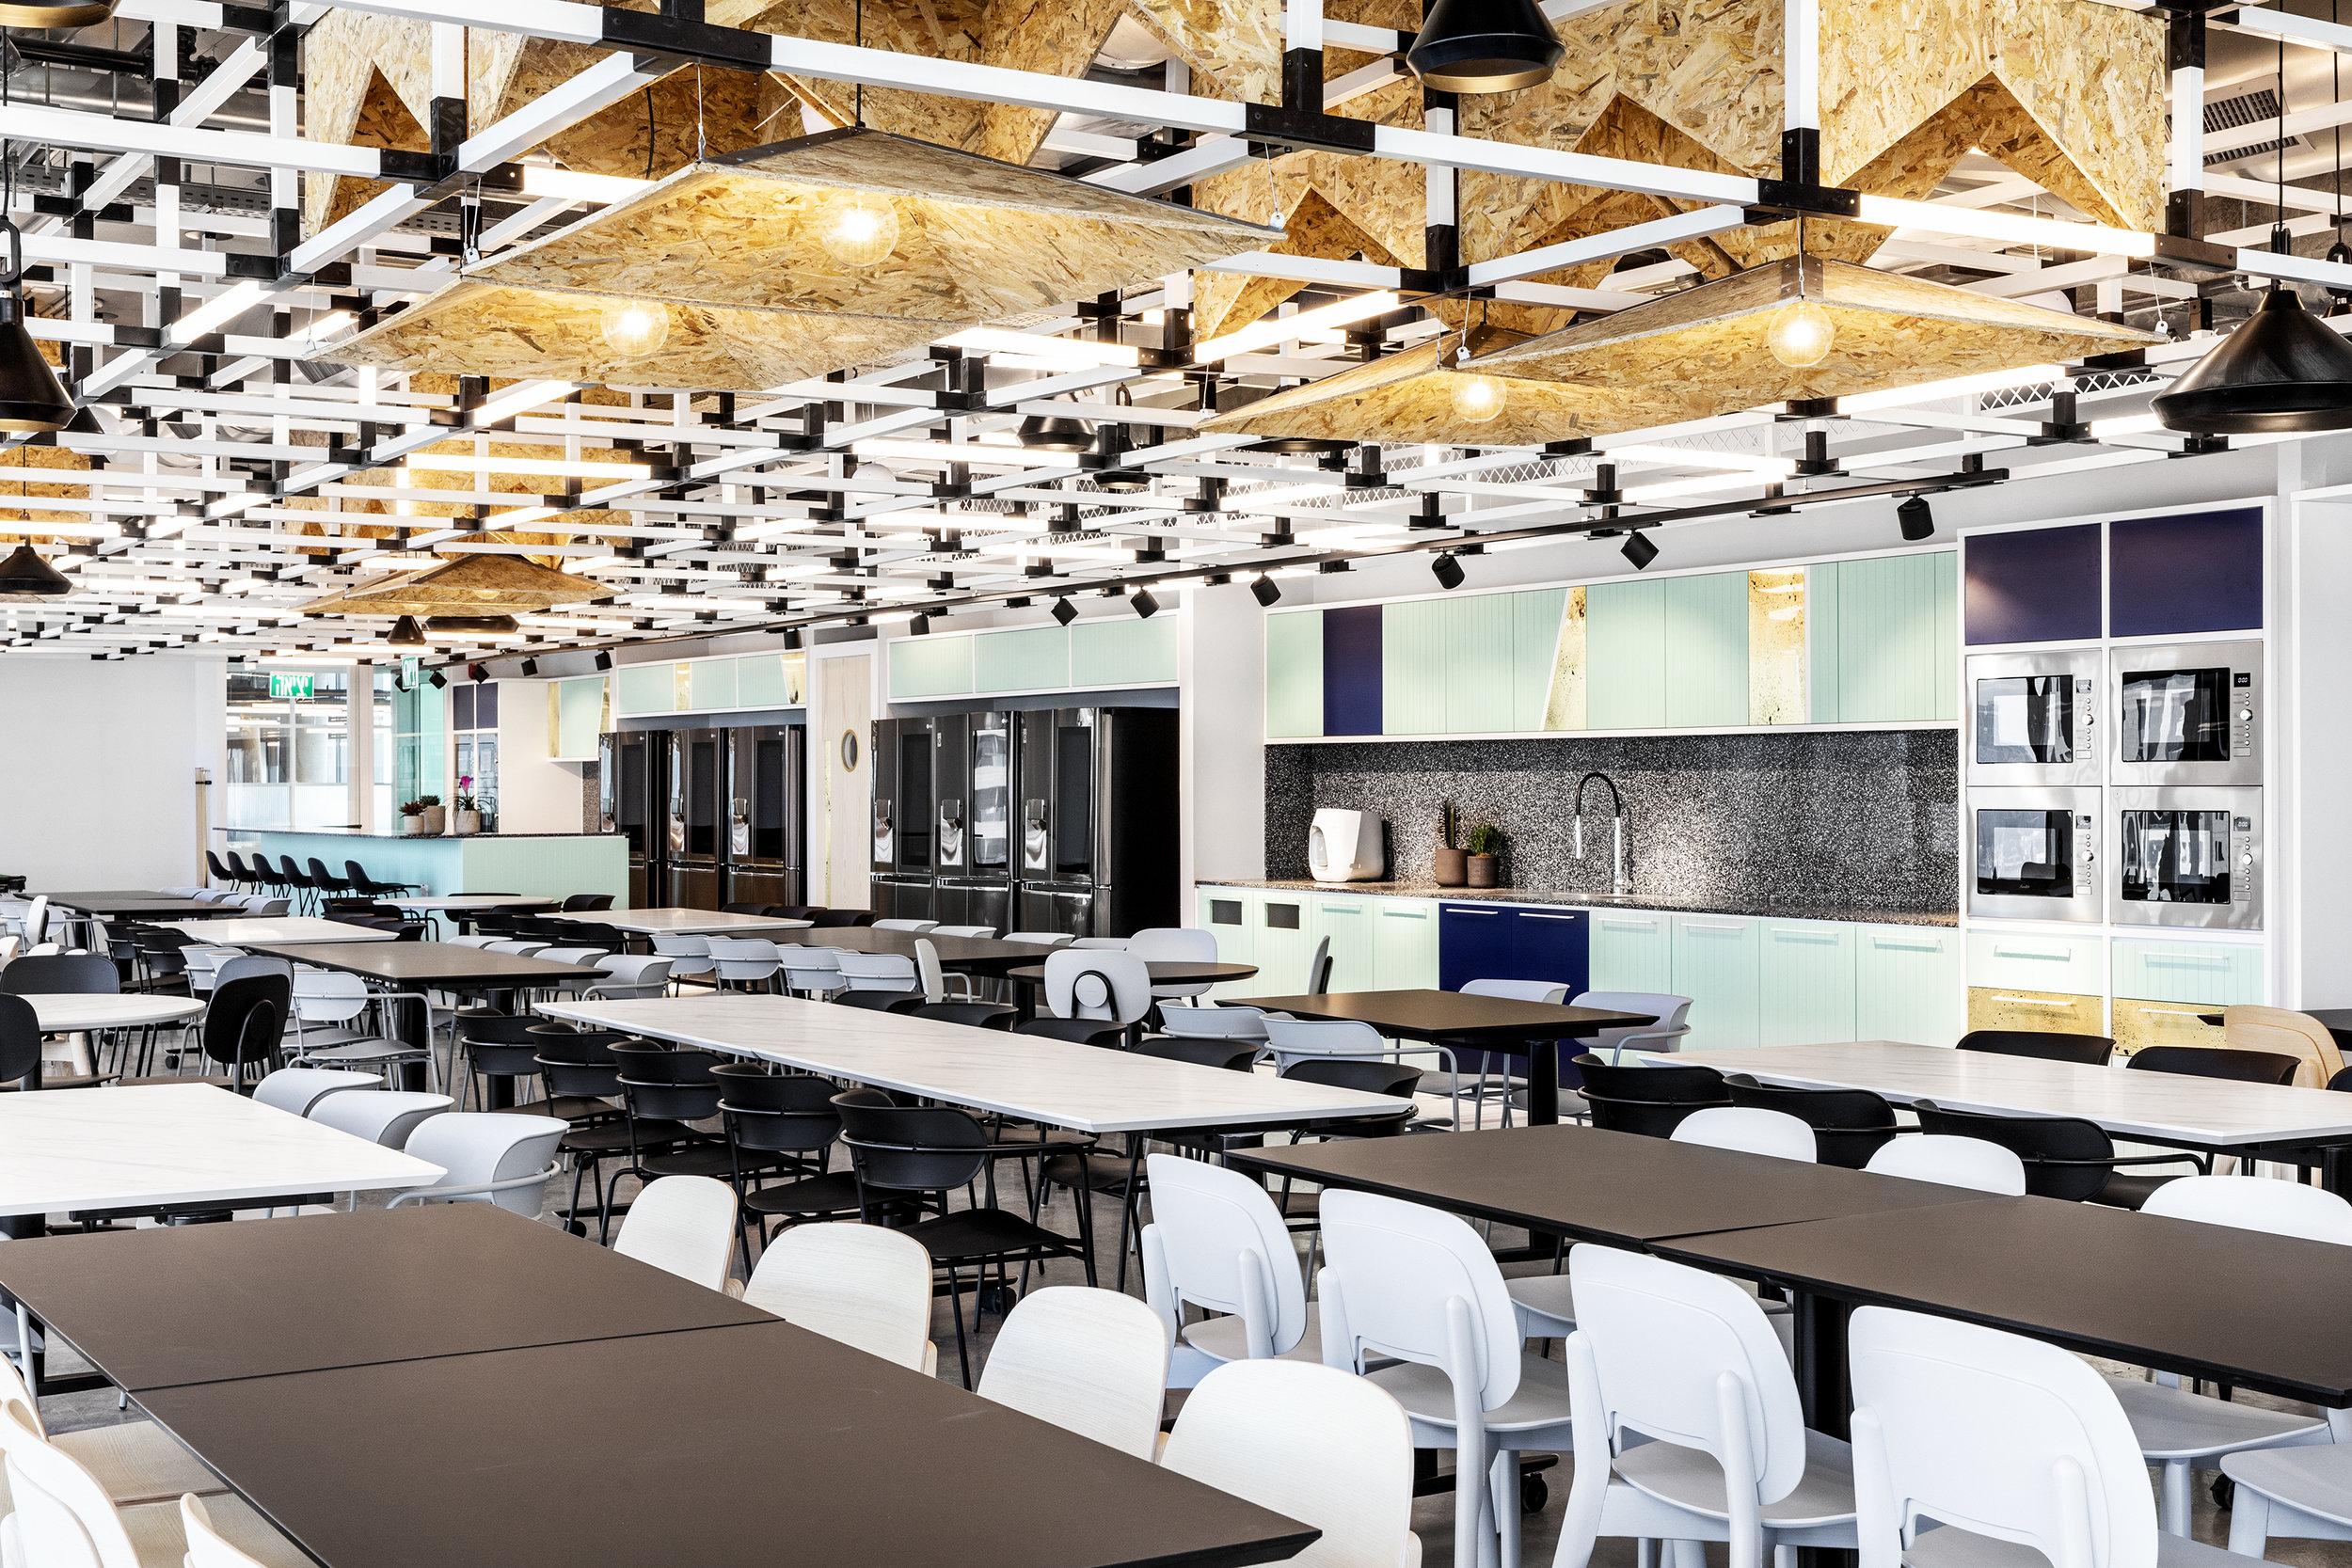 רואי דוד אדריכלות - אדריכל - נטורל אינטליג'נס - ROY DAVID - ARCHITECTURE - ARCHITECT - NI (9).jpg